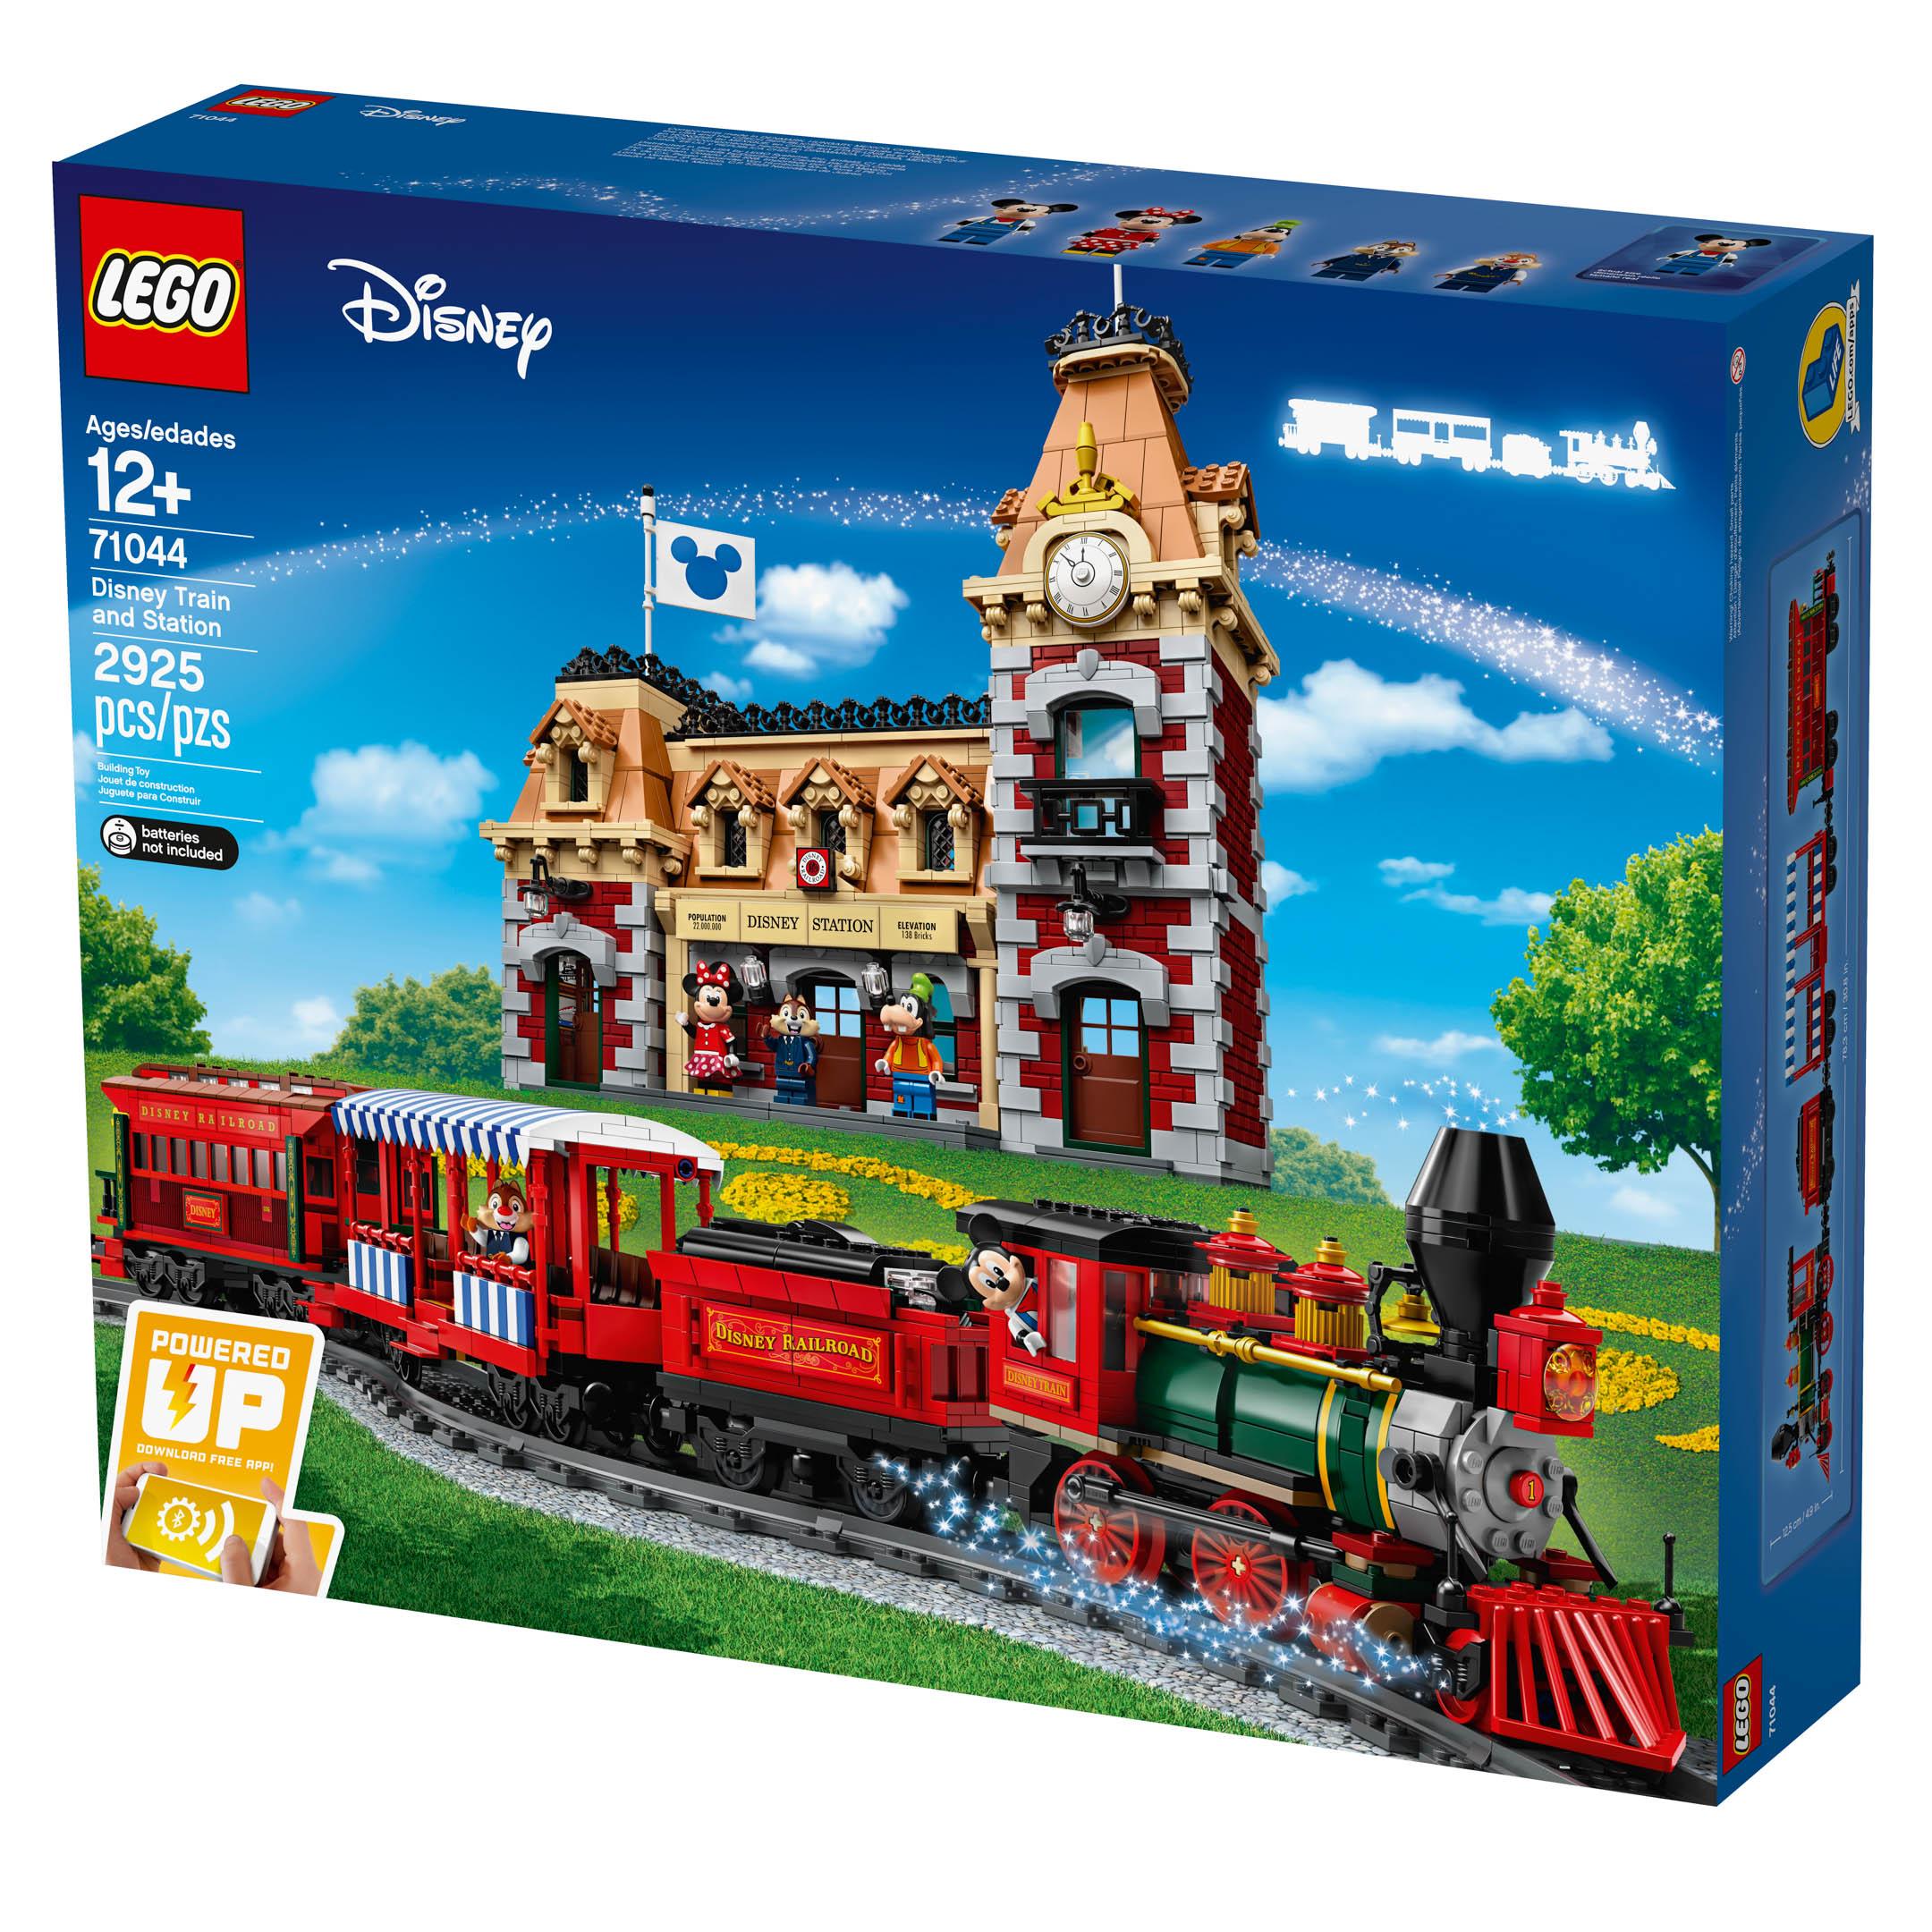 LEGO reveals massive new Disneyland Railroad set, 71044